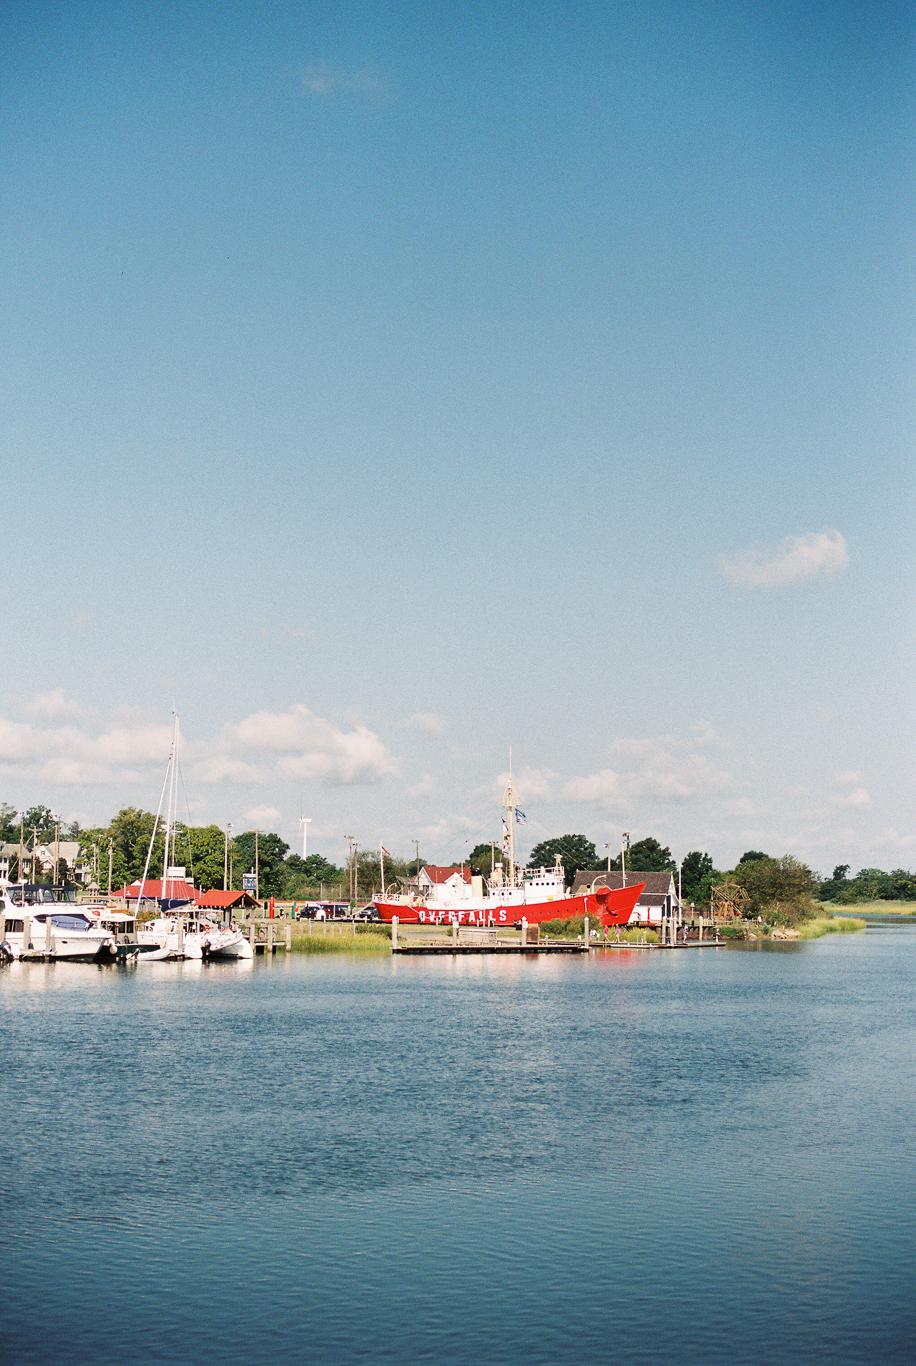 Maryland-delaware-beach-film-photographer-BKLP-lifestyle-rehobeth-funland-breanna kuhlmann-1.jpg